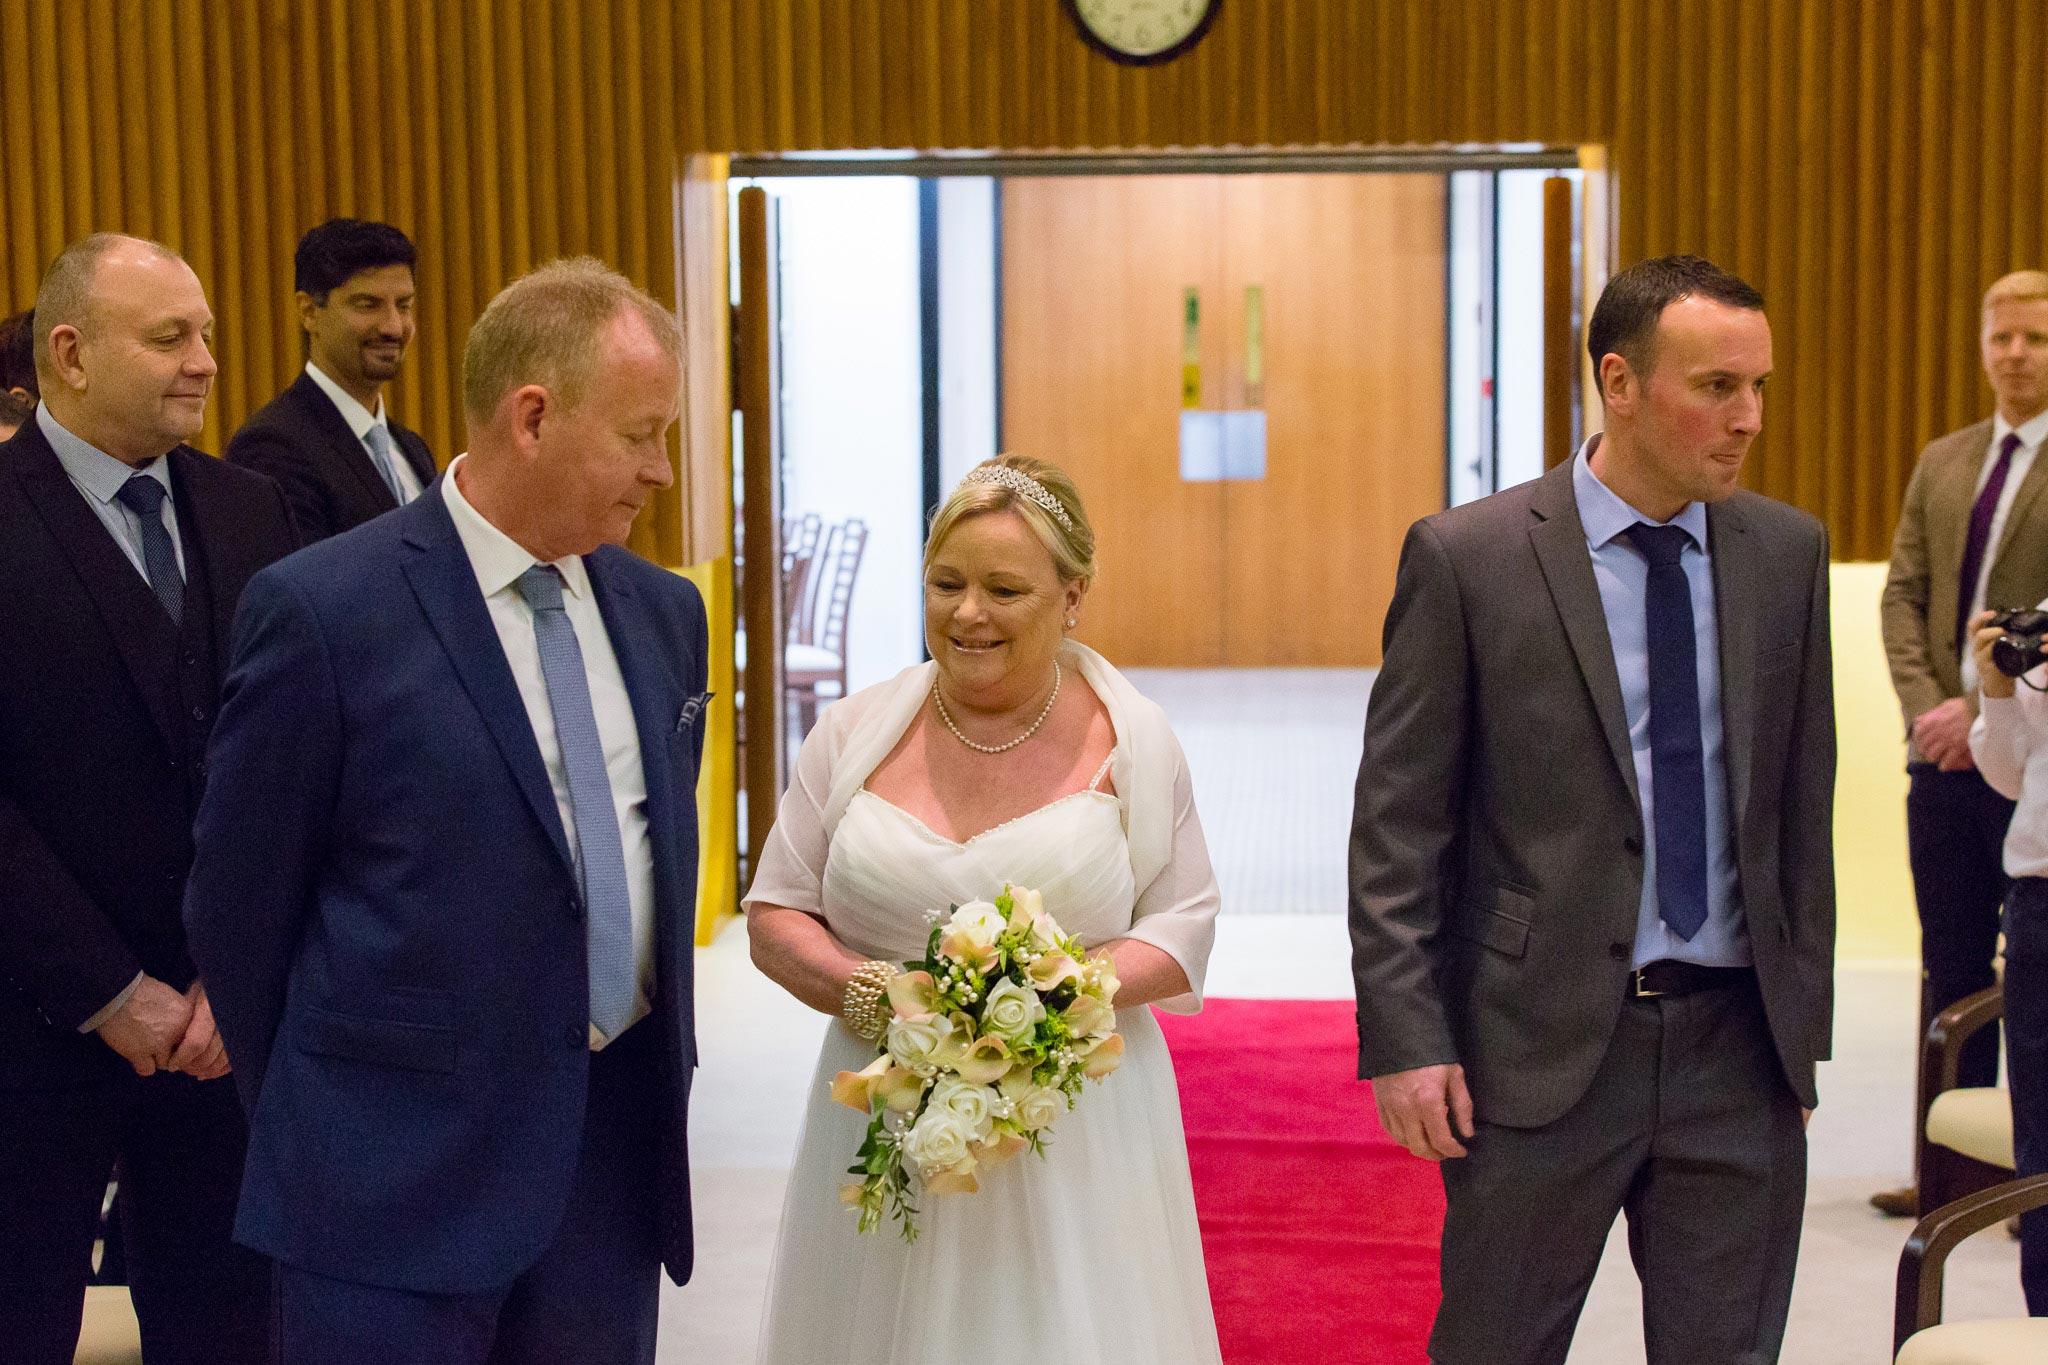 John & Heather Ceremony - Darlington Registry Office